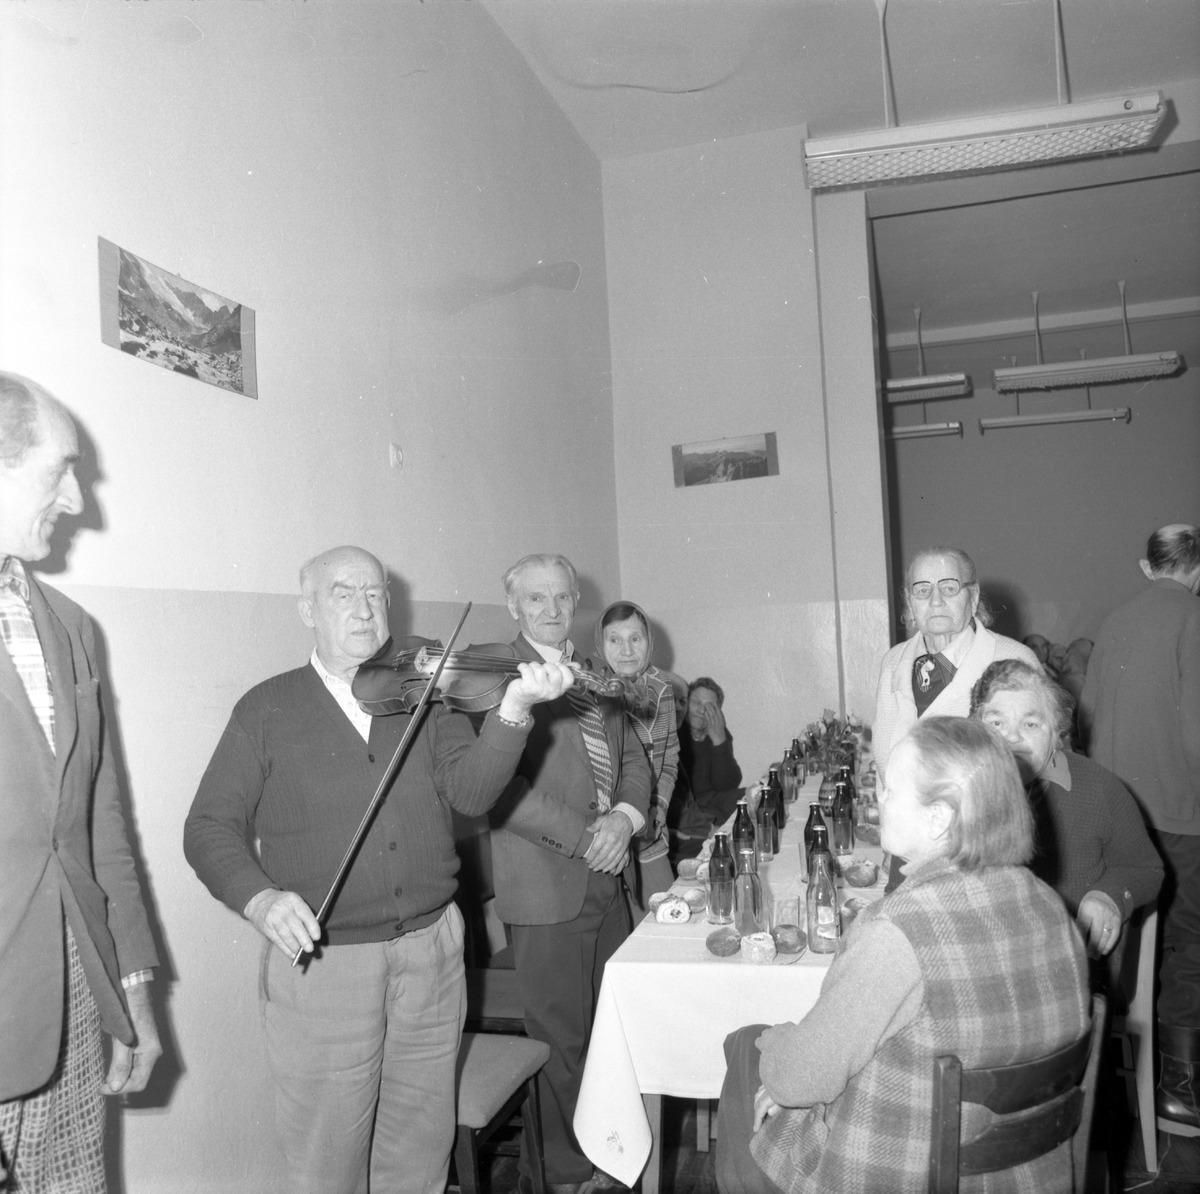 Obchody Dnia Seniora, 1985 r. [1]